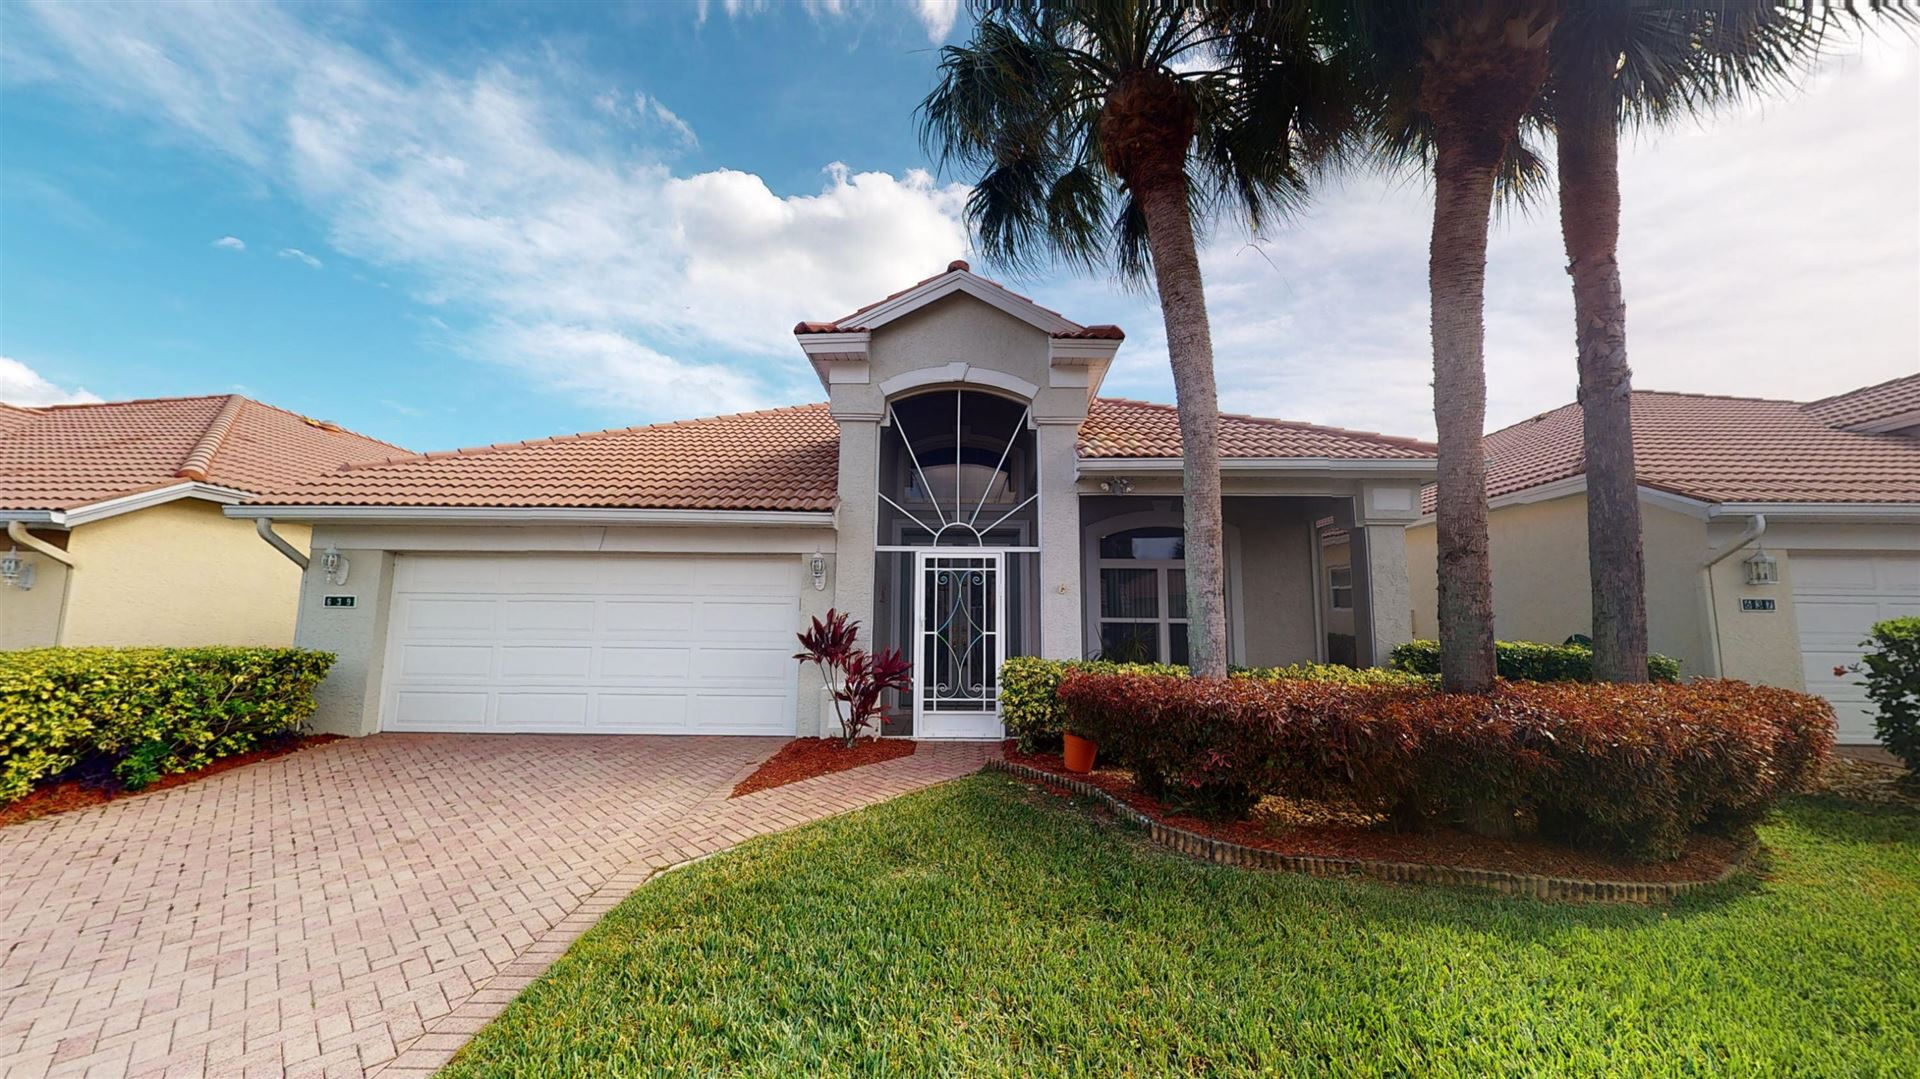 639 NW San Candido Way, Port Saint Lucie, FL 34986 - #: RX-10679103